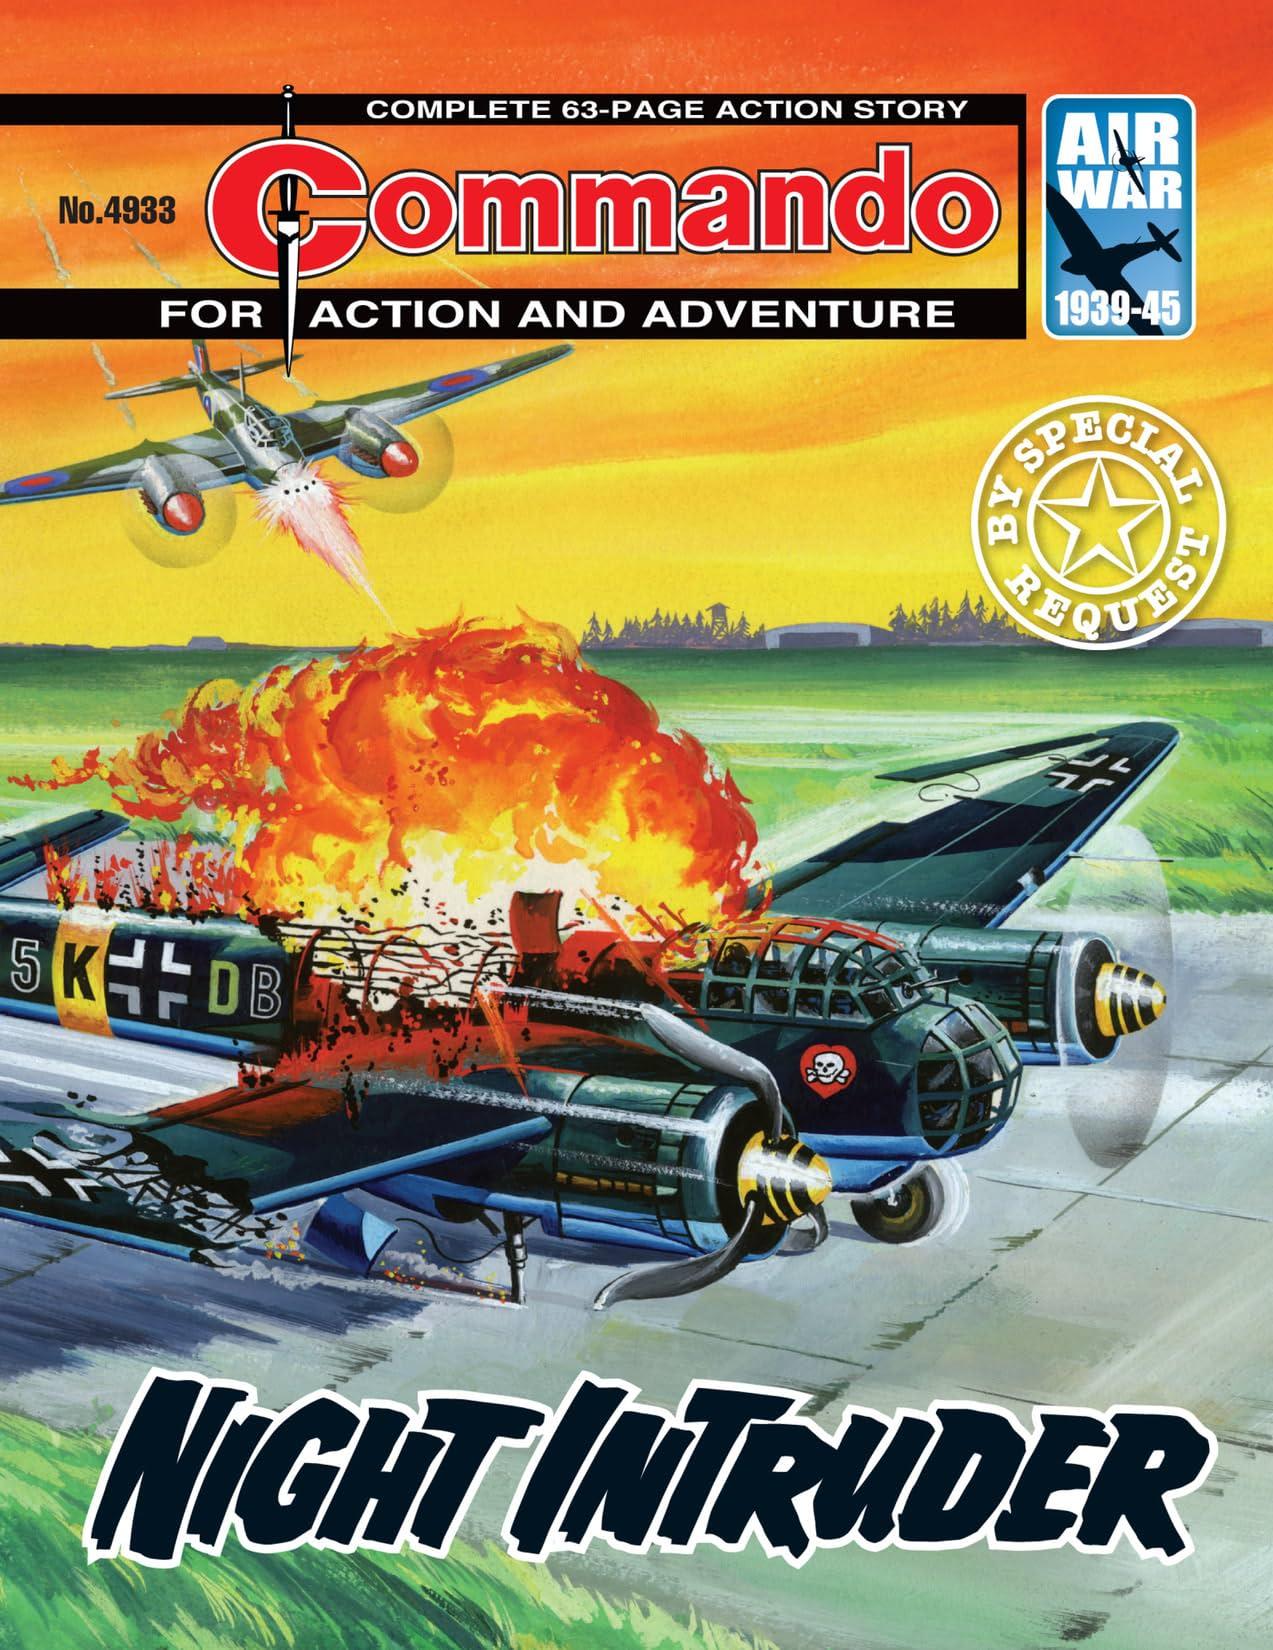 Commando #4933: Night Intruder